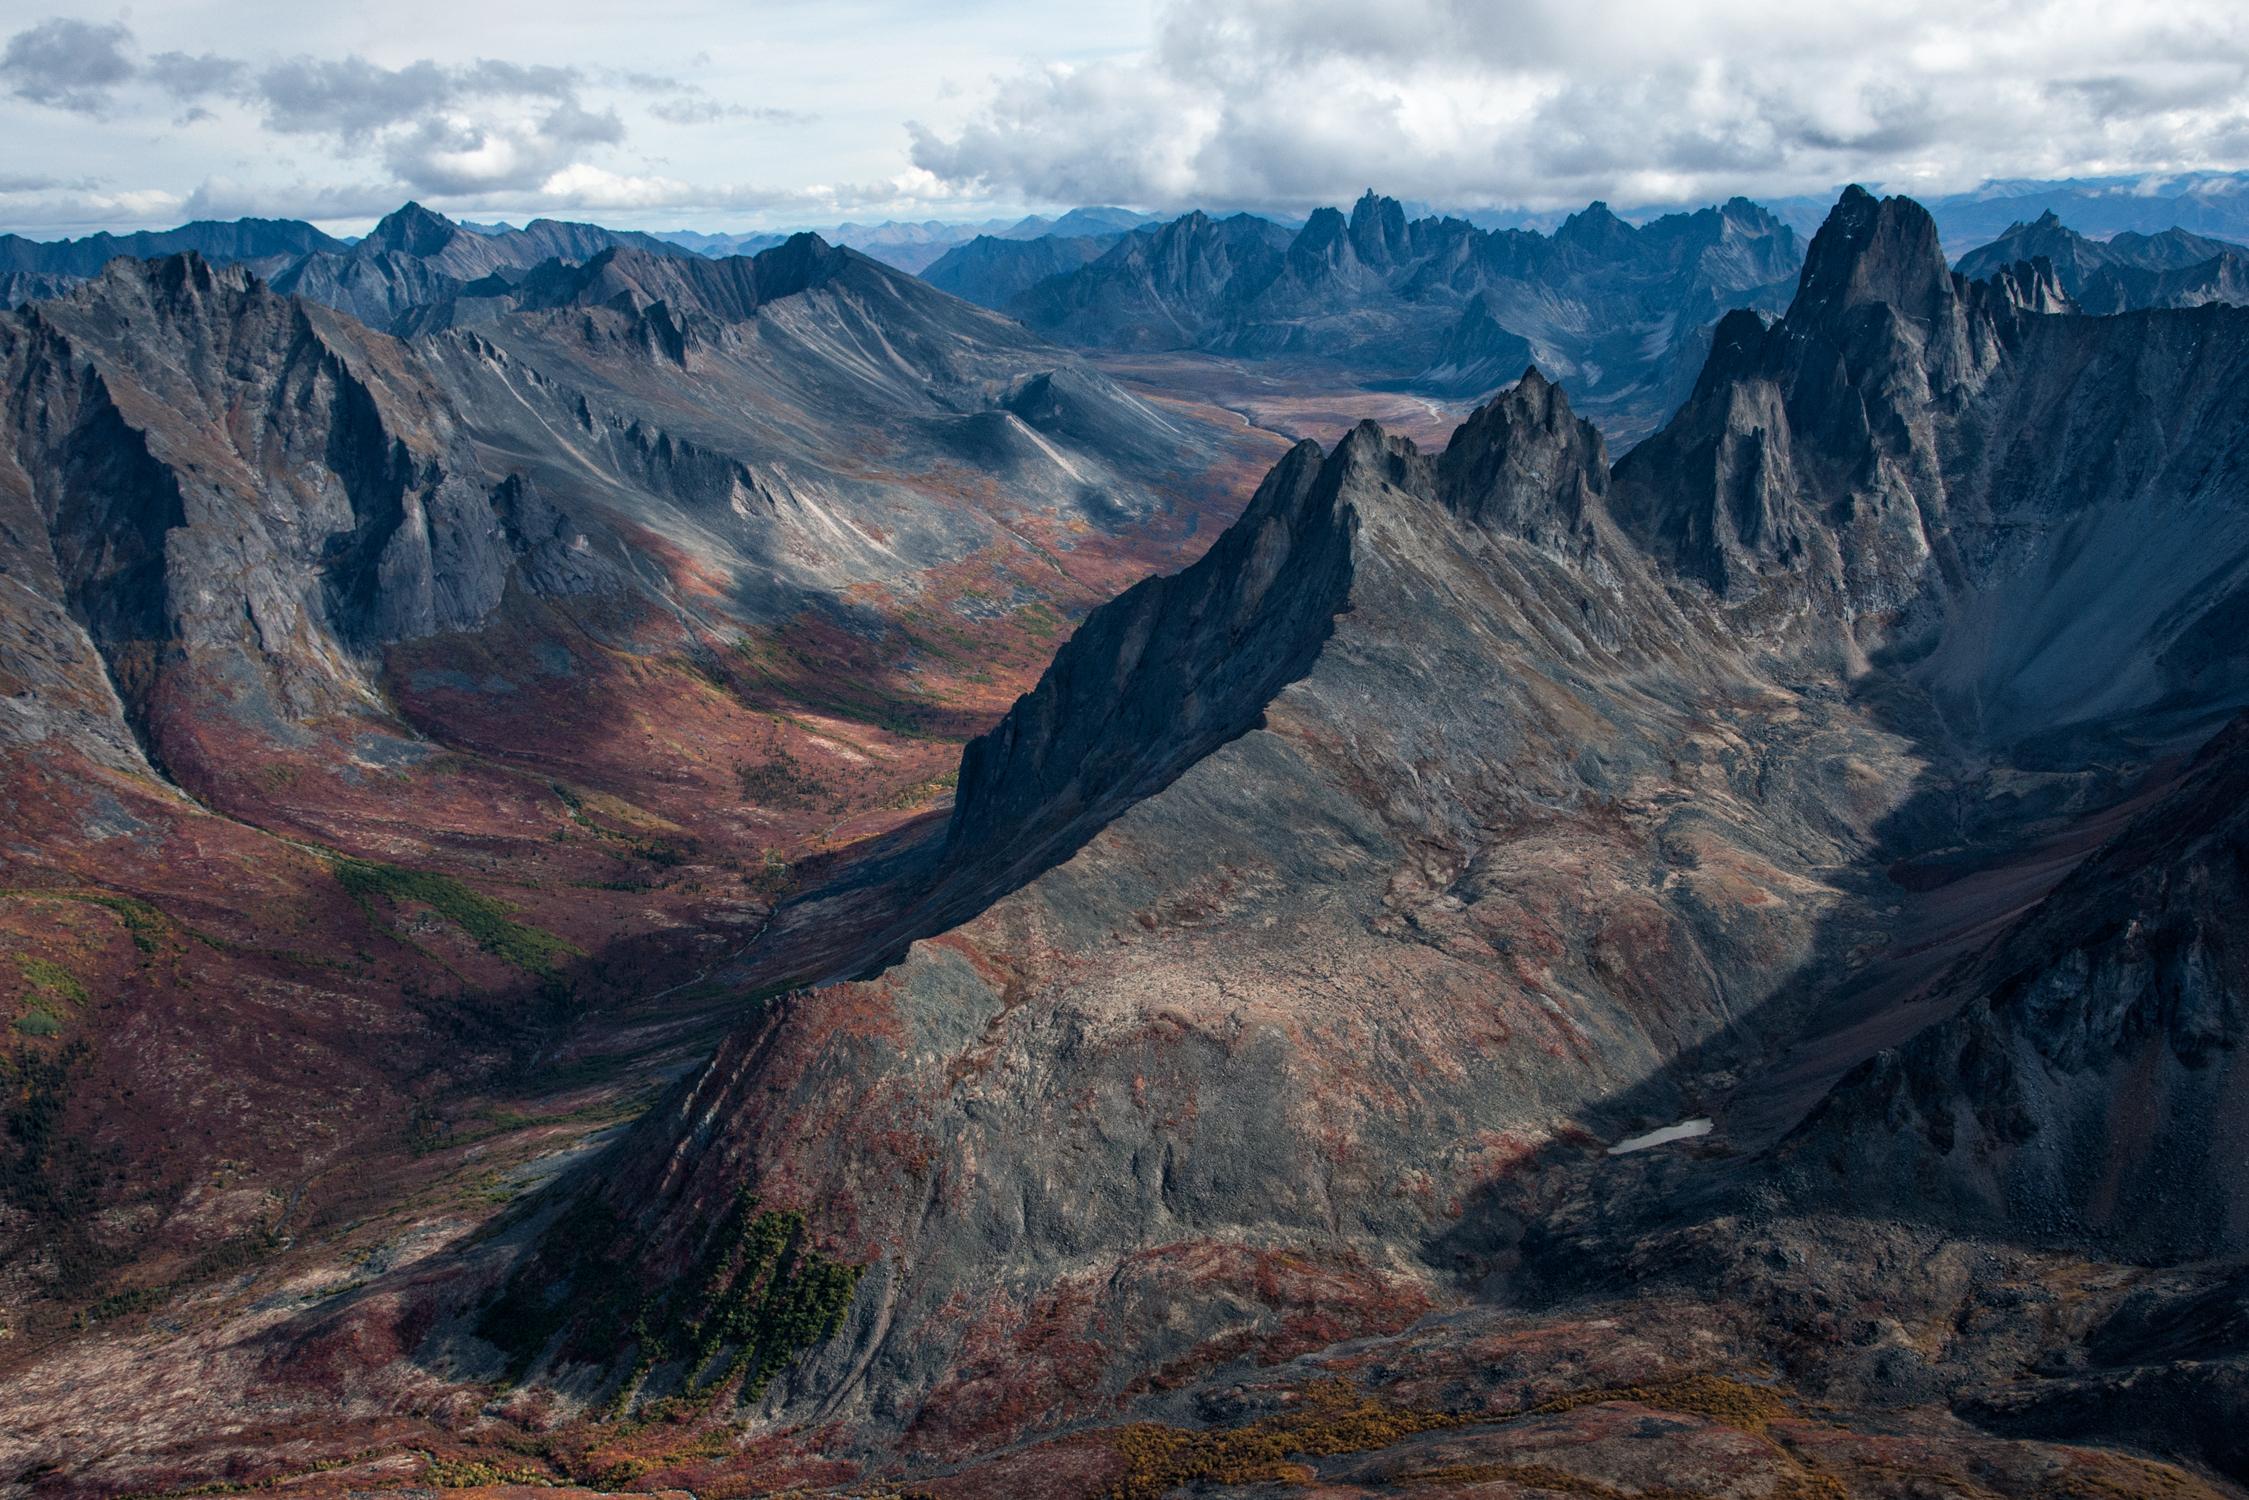 aerial view of Klondike Valley mountain range in Tombstone Territorial park